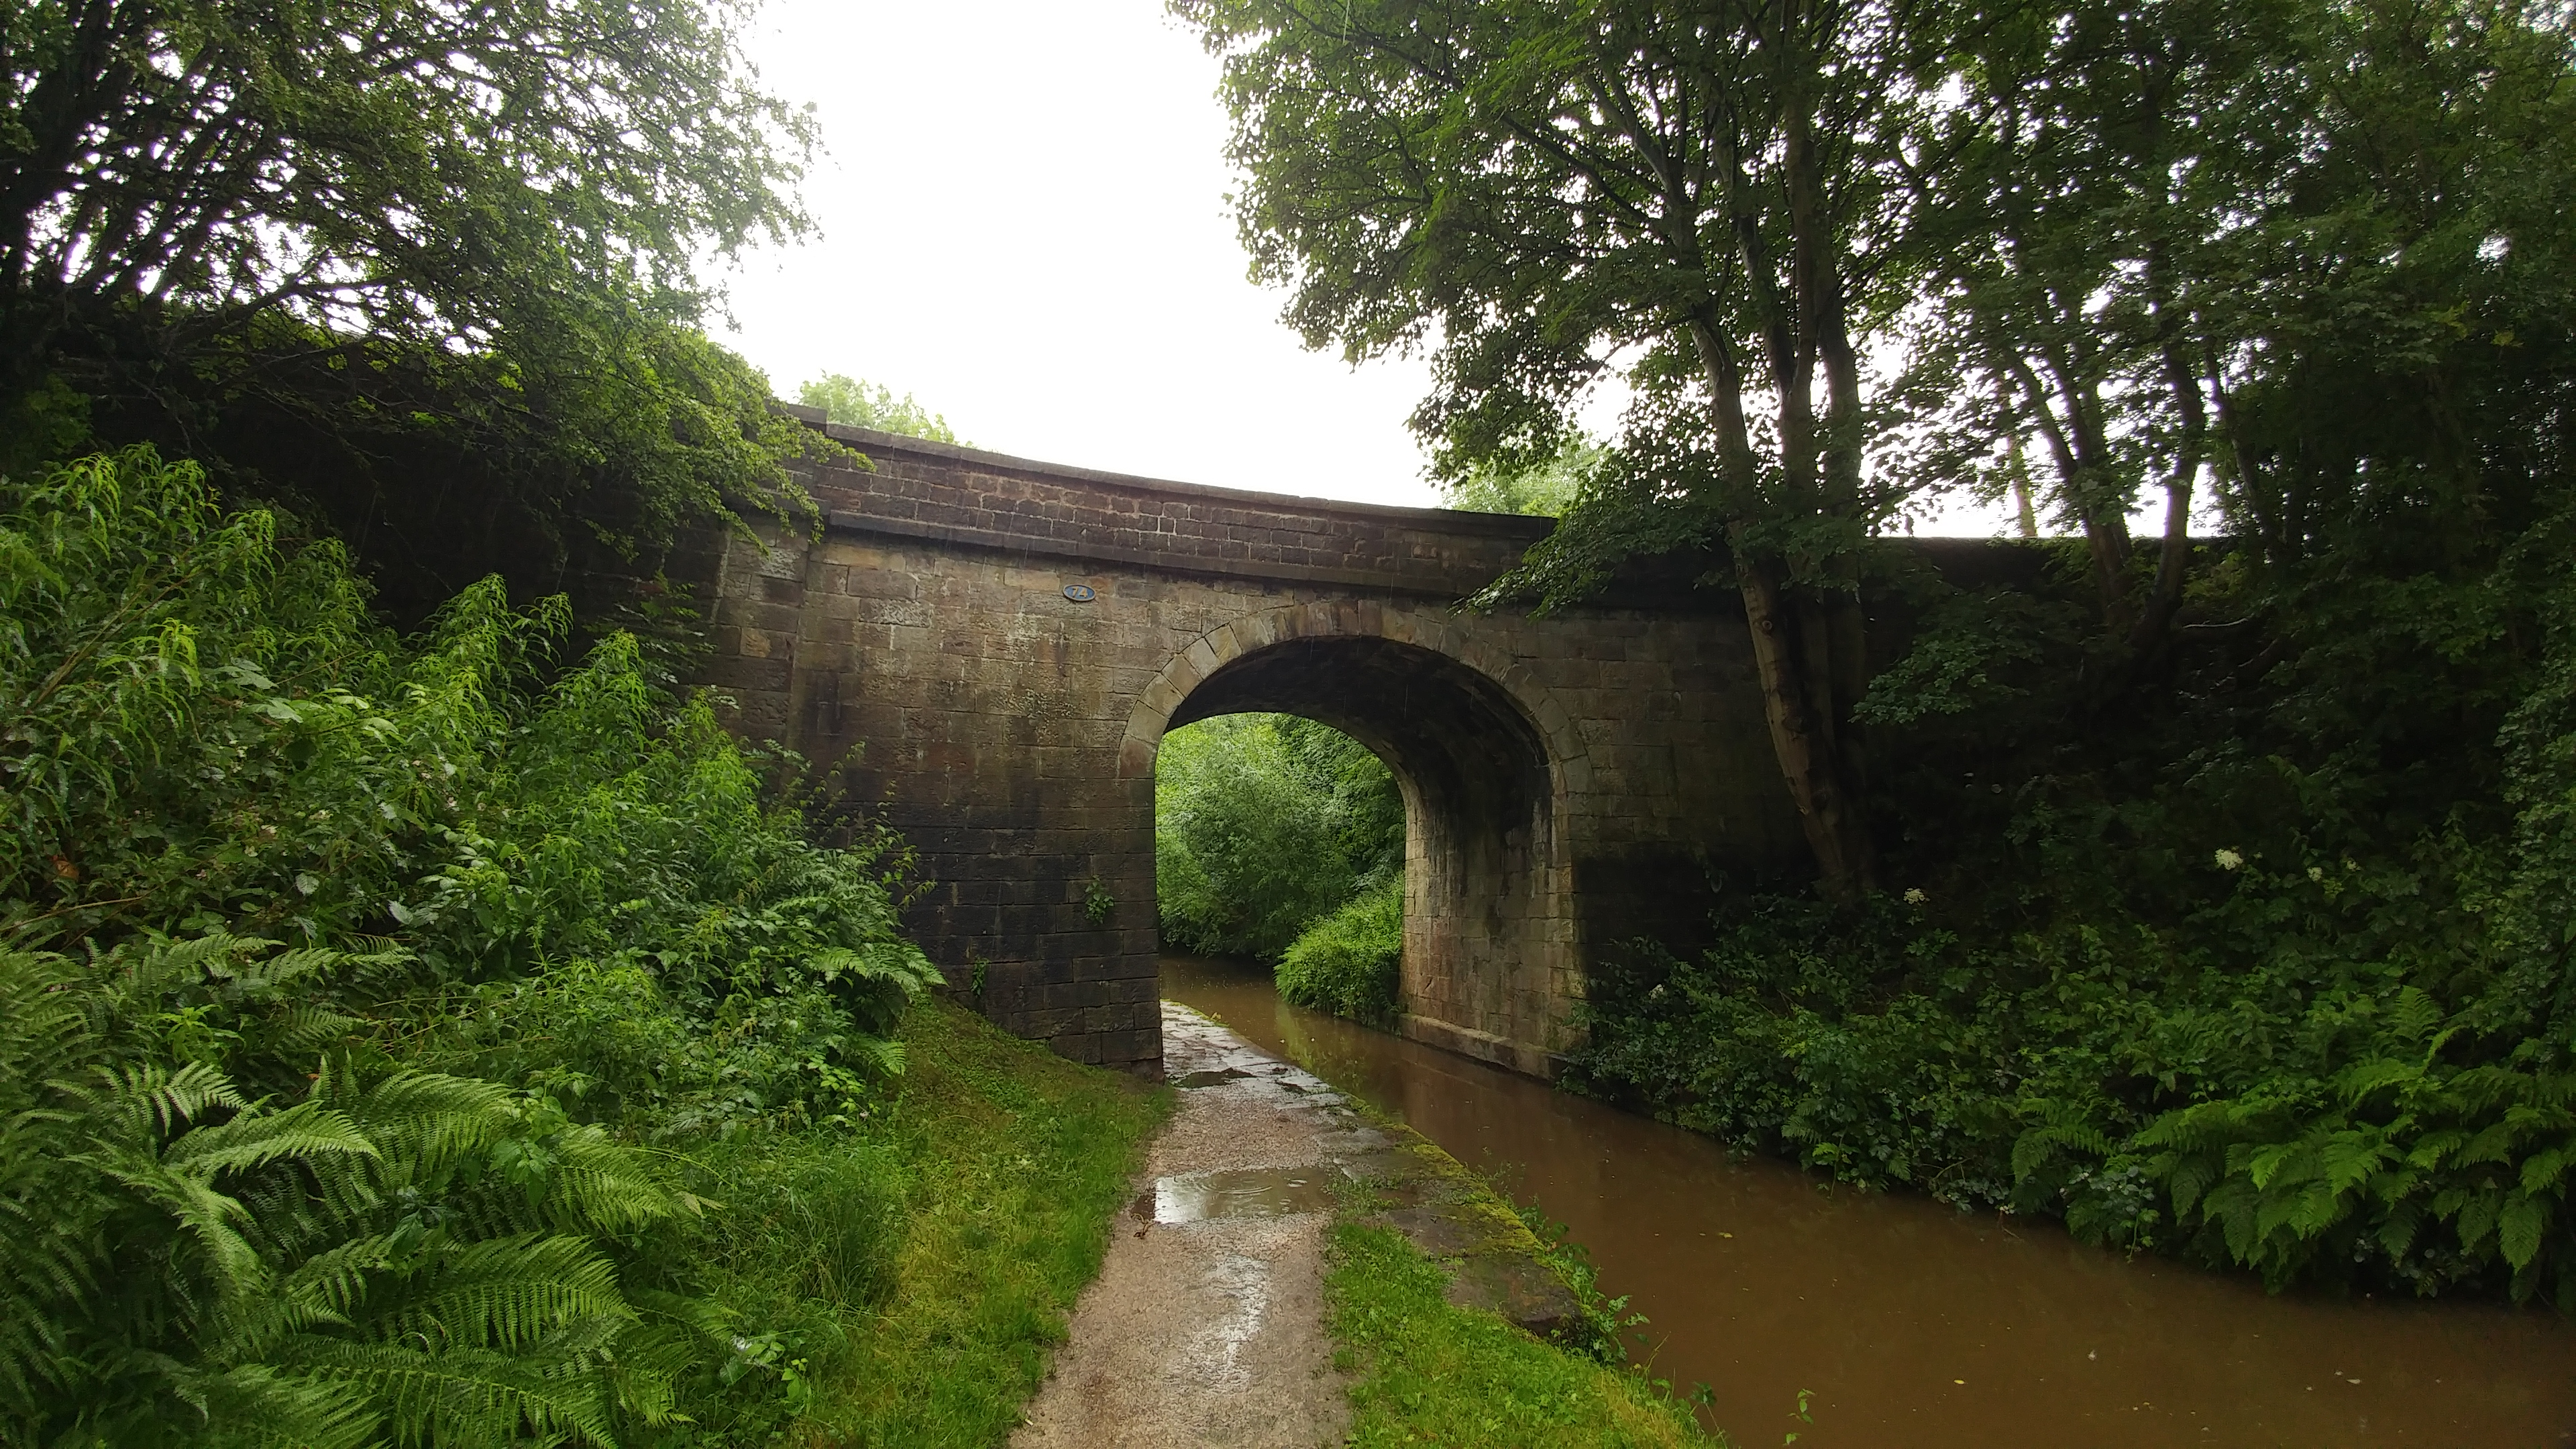 Bridge 74 just outside Congleton